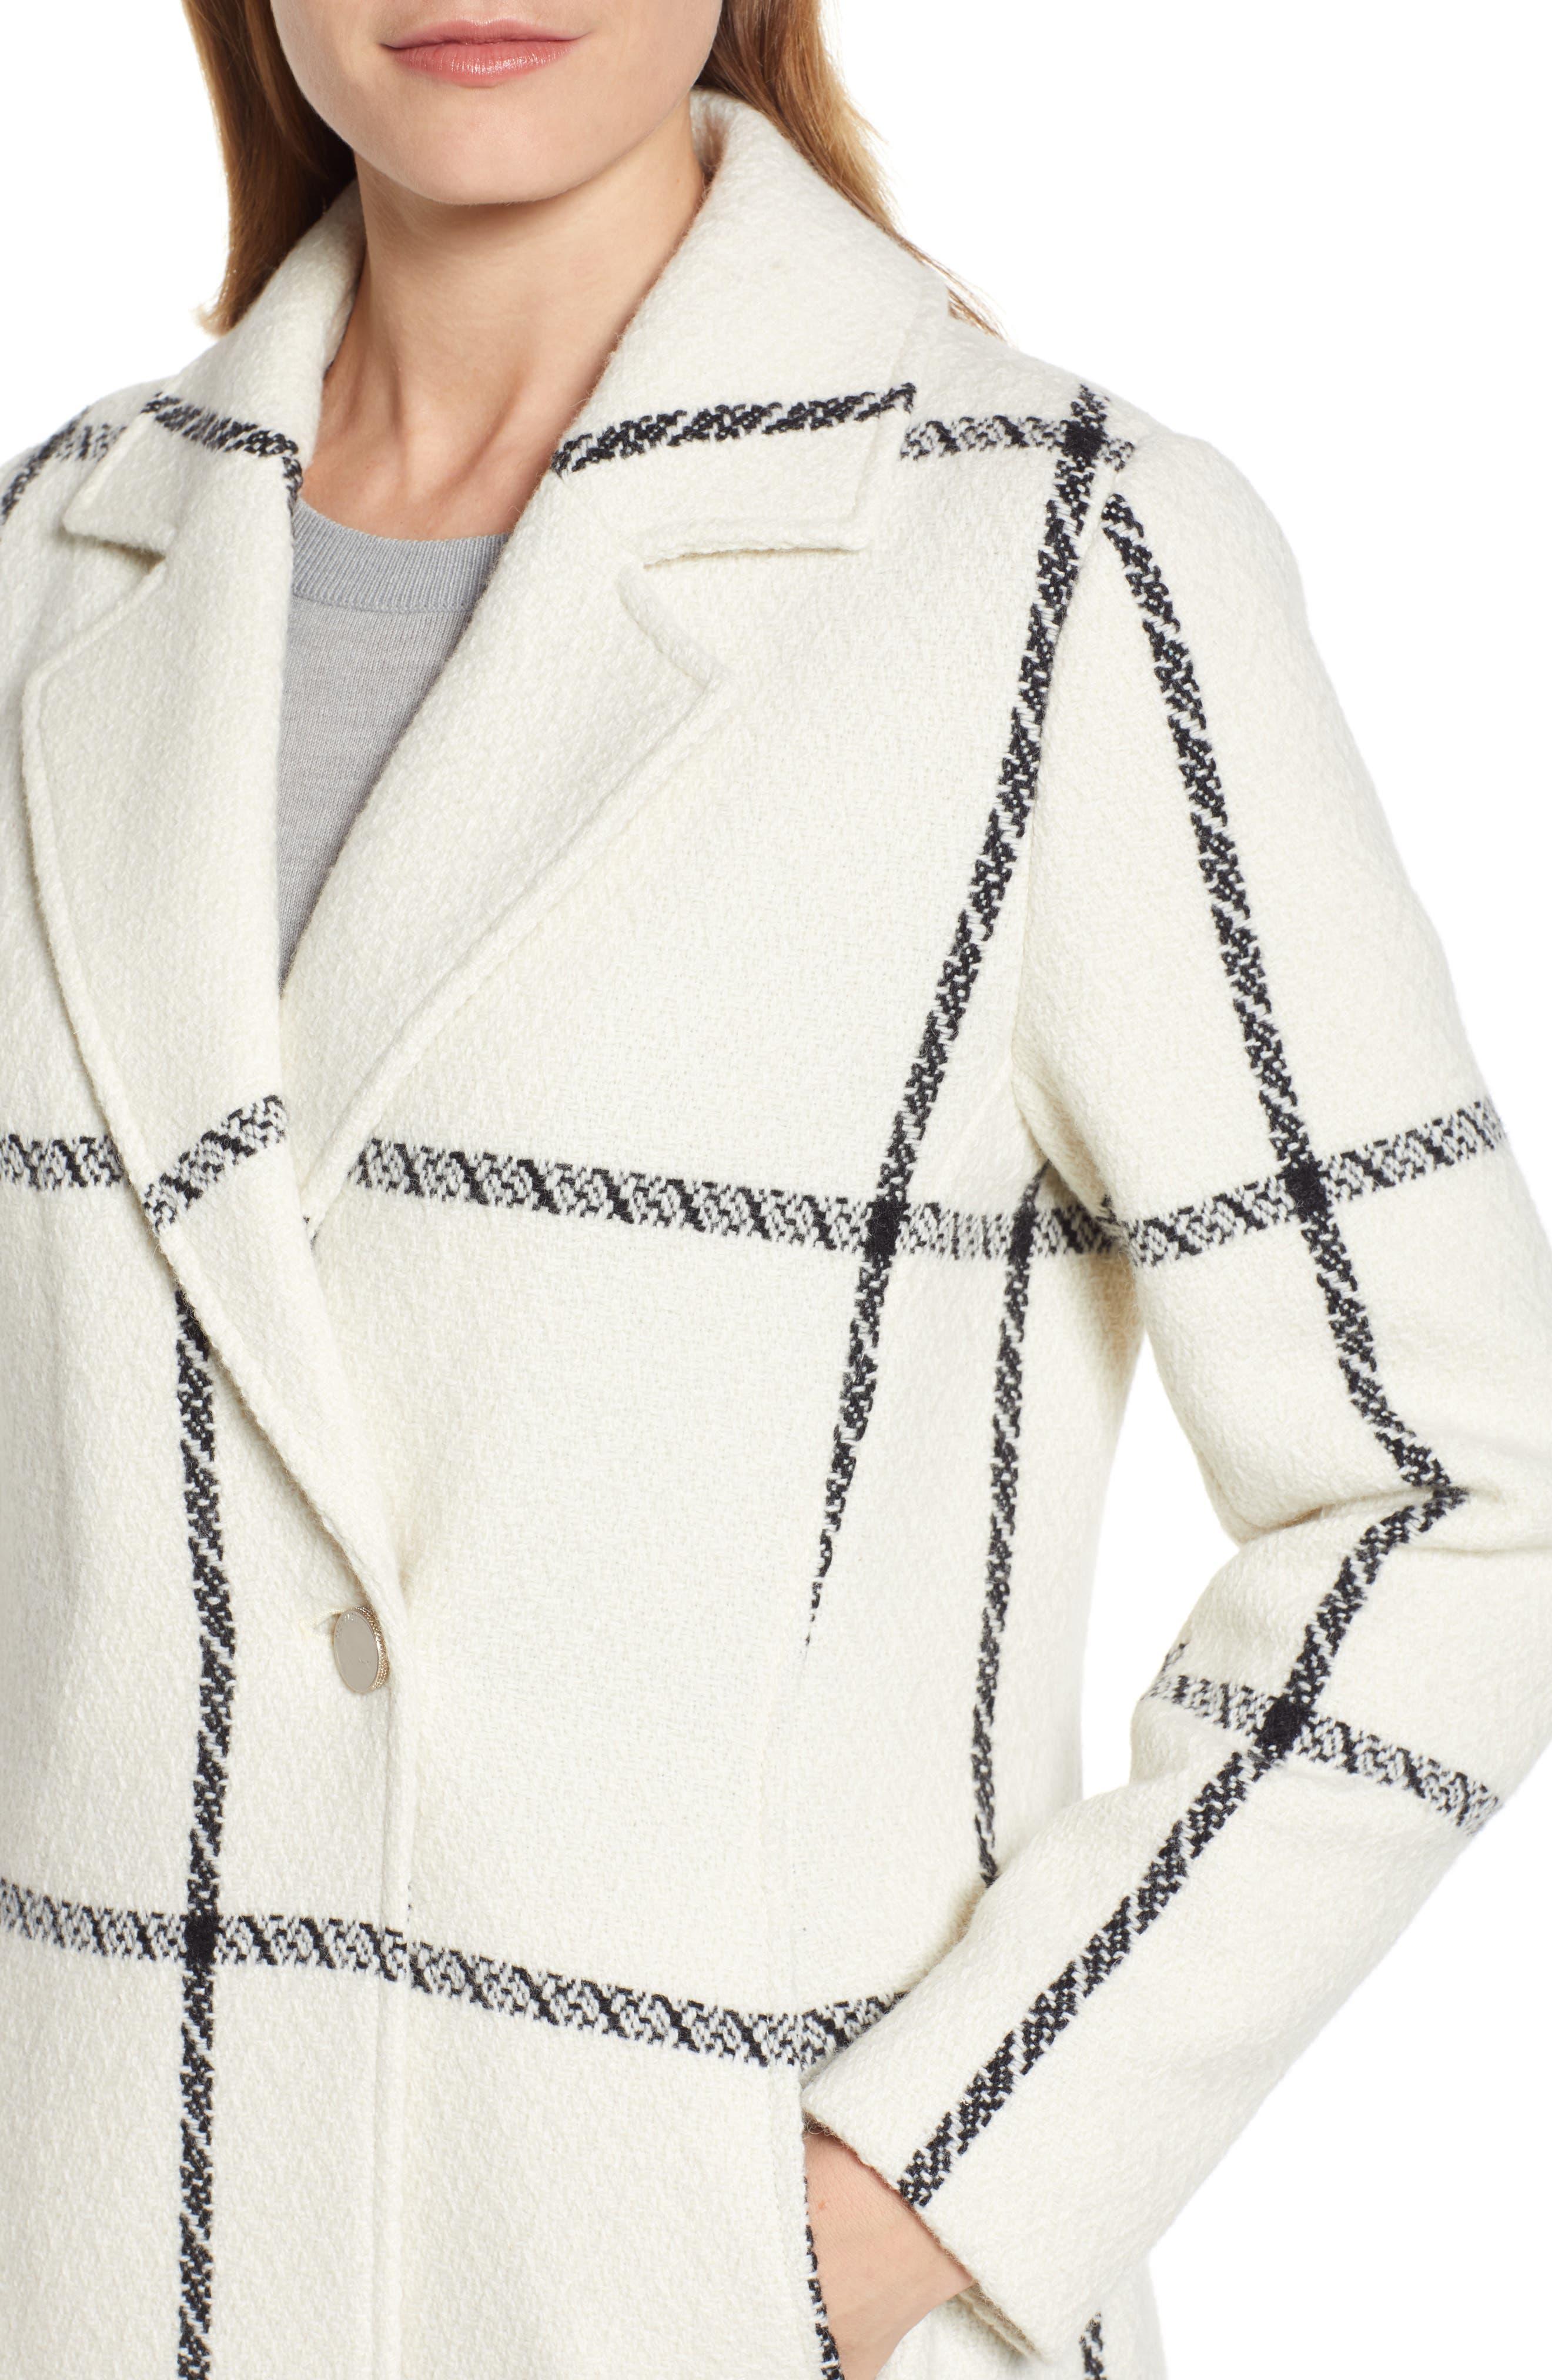 TED BAKER LONDON,                             Soniq Check Wool Blend Long Coat,                             Alternate thumbnail 5, color,                             92-IVORY